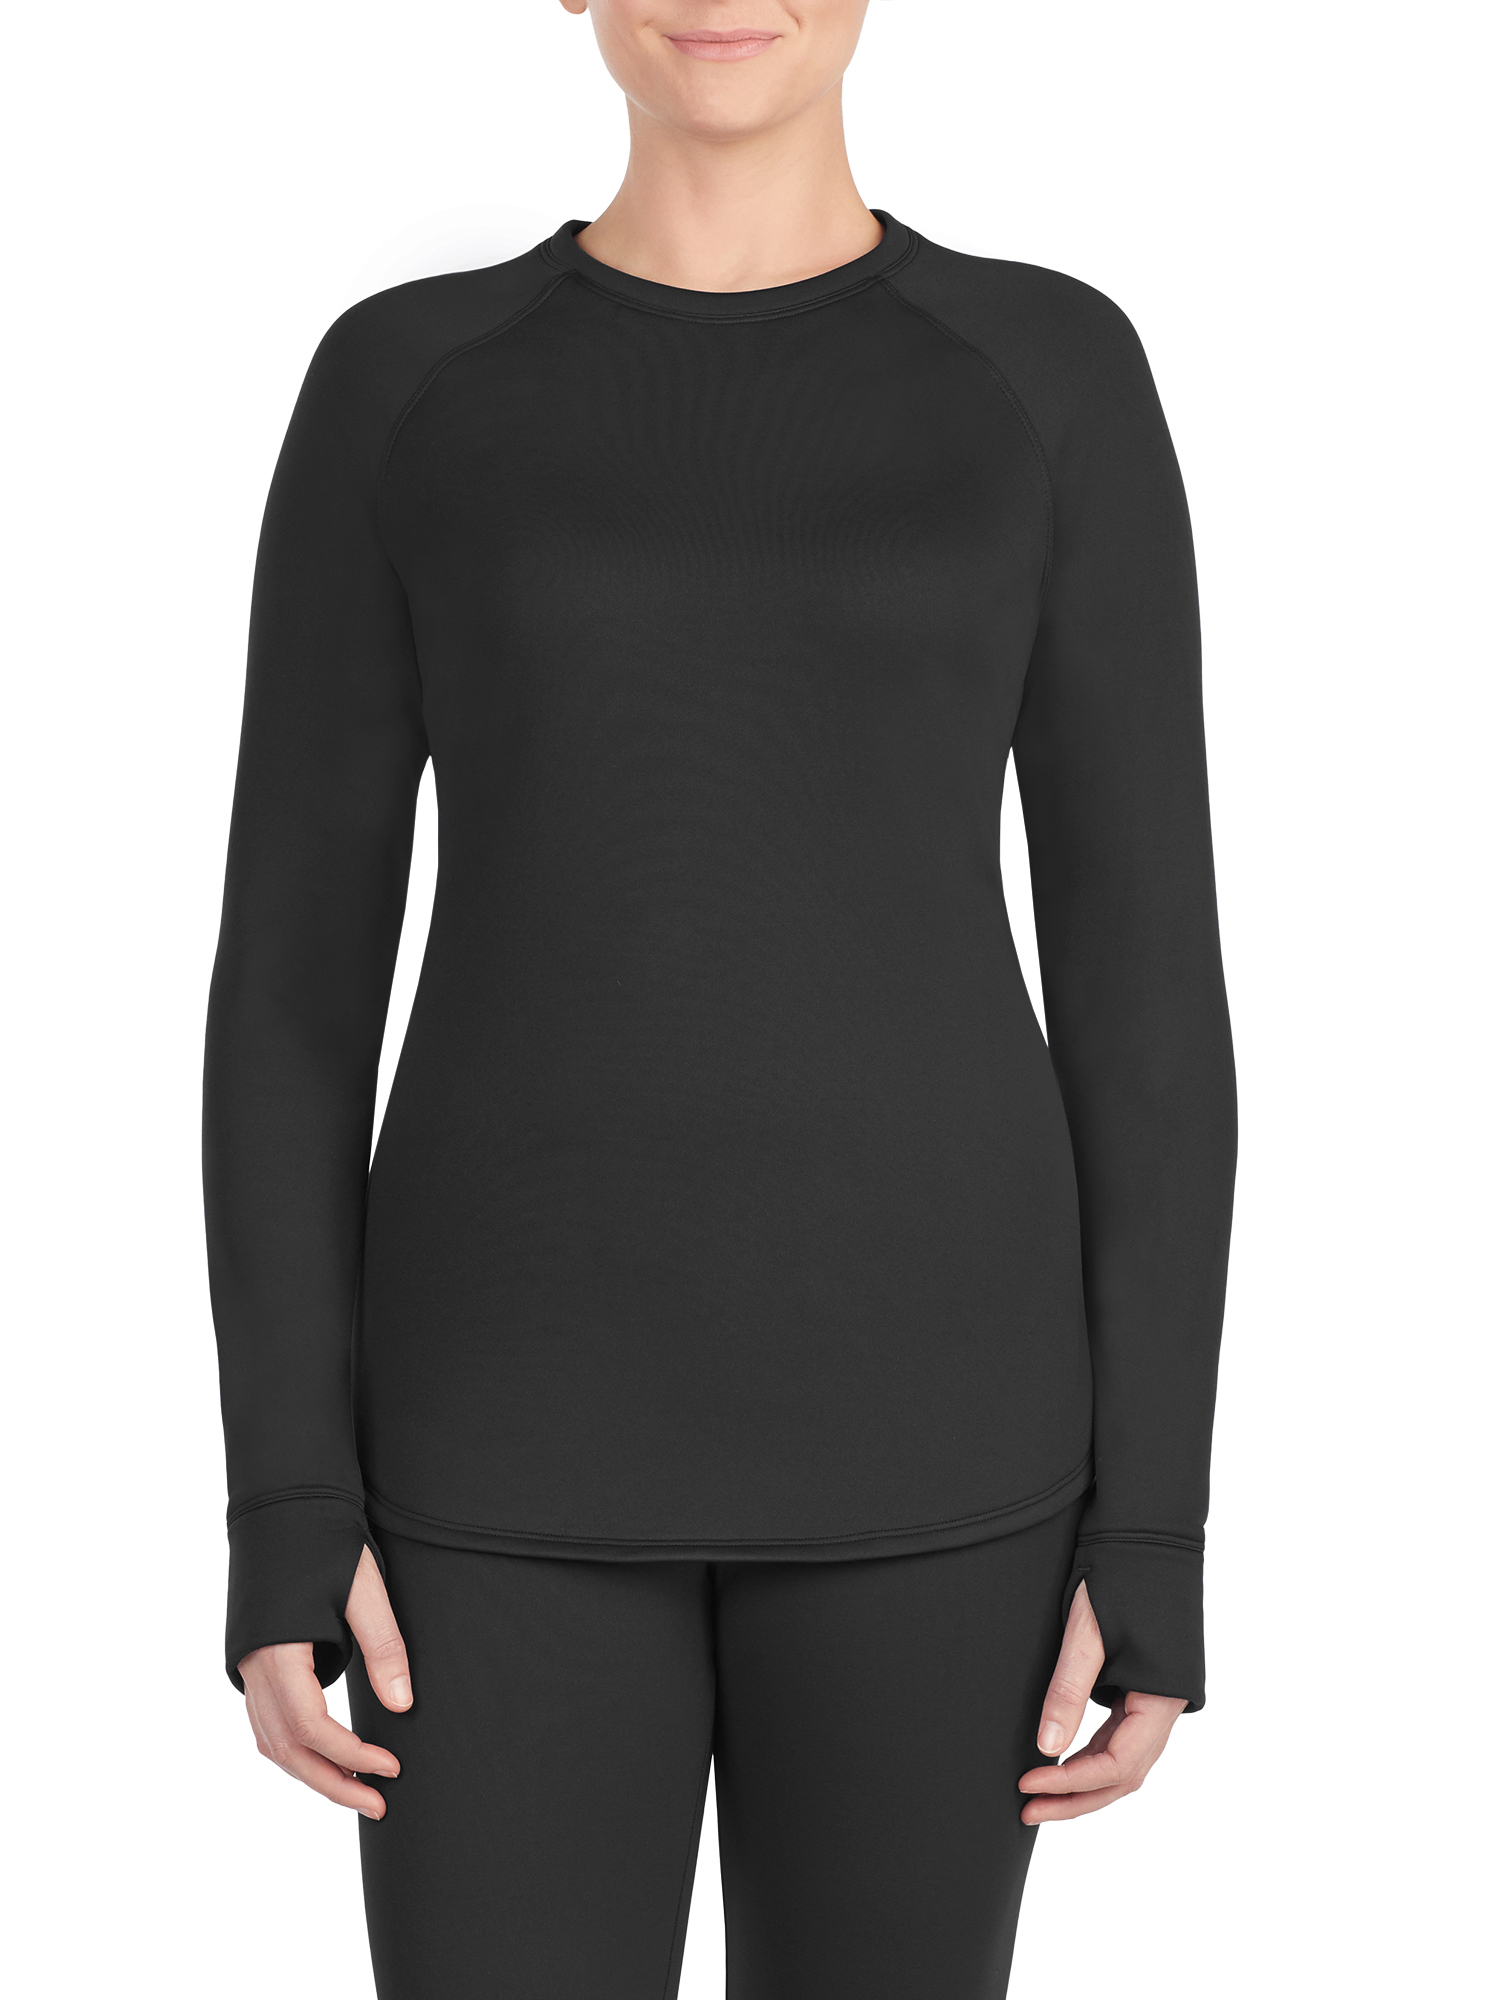 Women's thermal guard long underwear long sleeve crew neck top